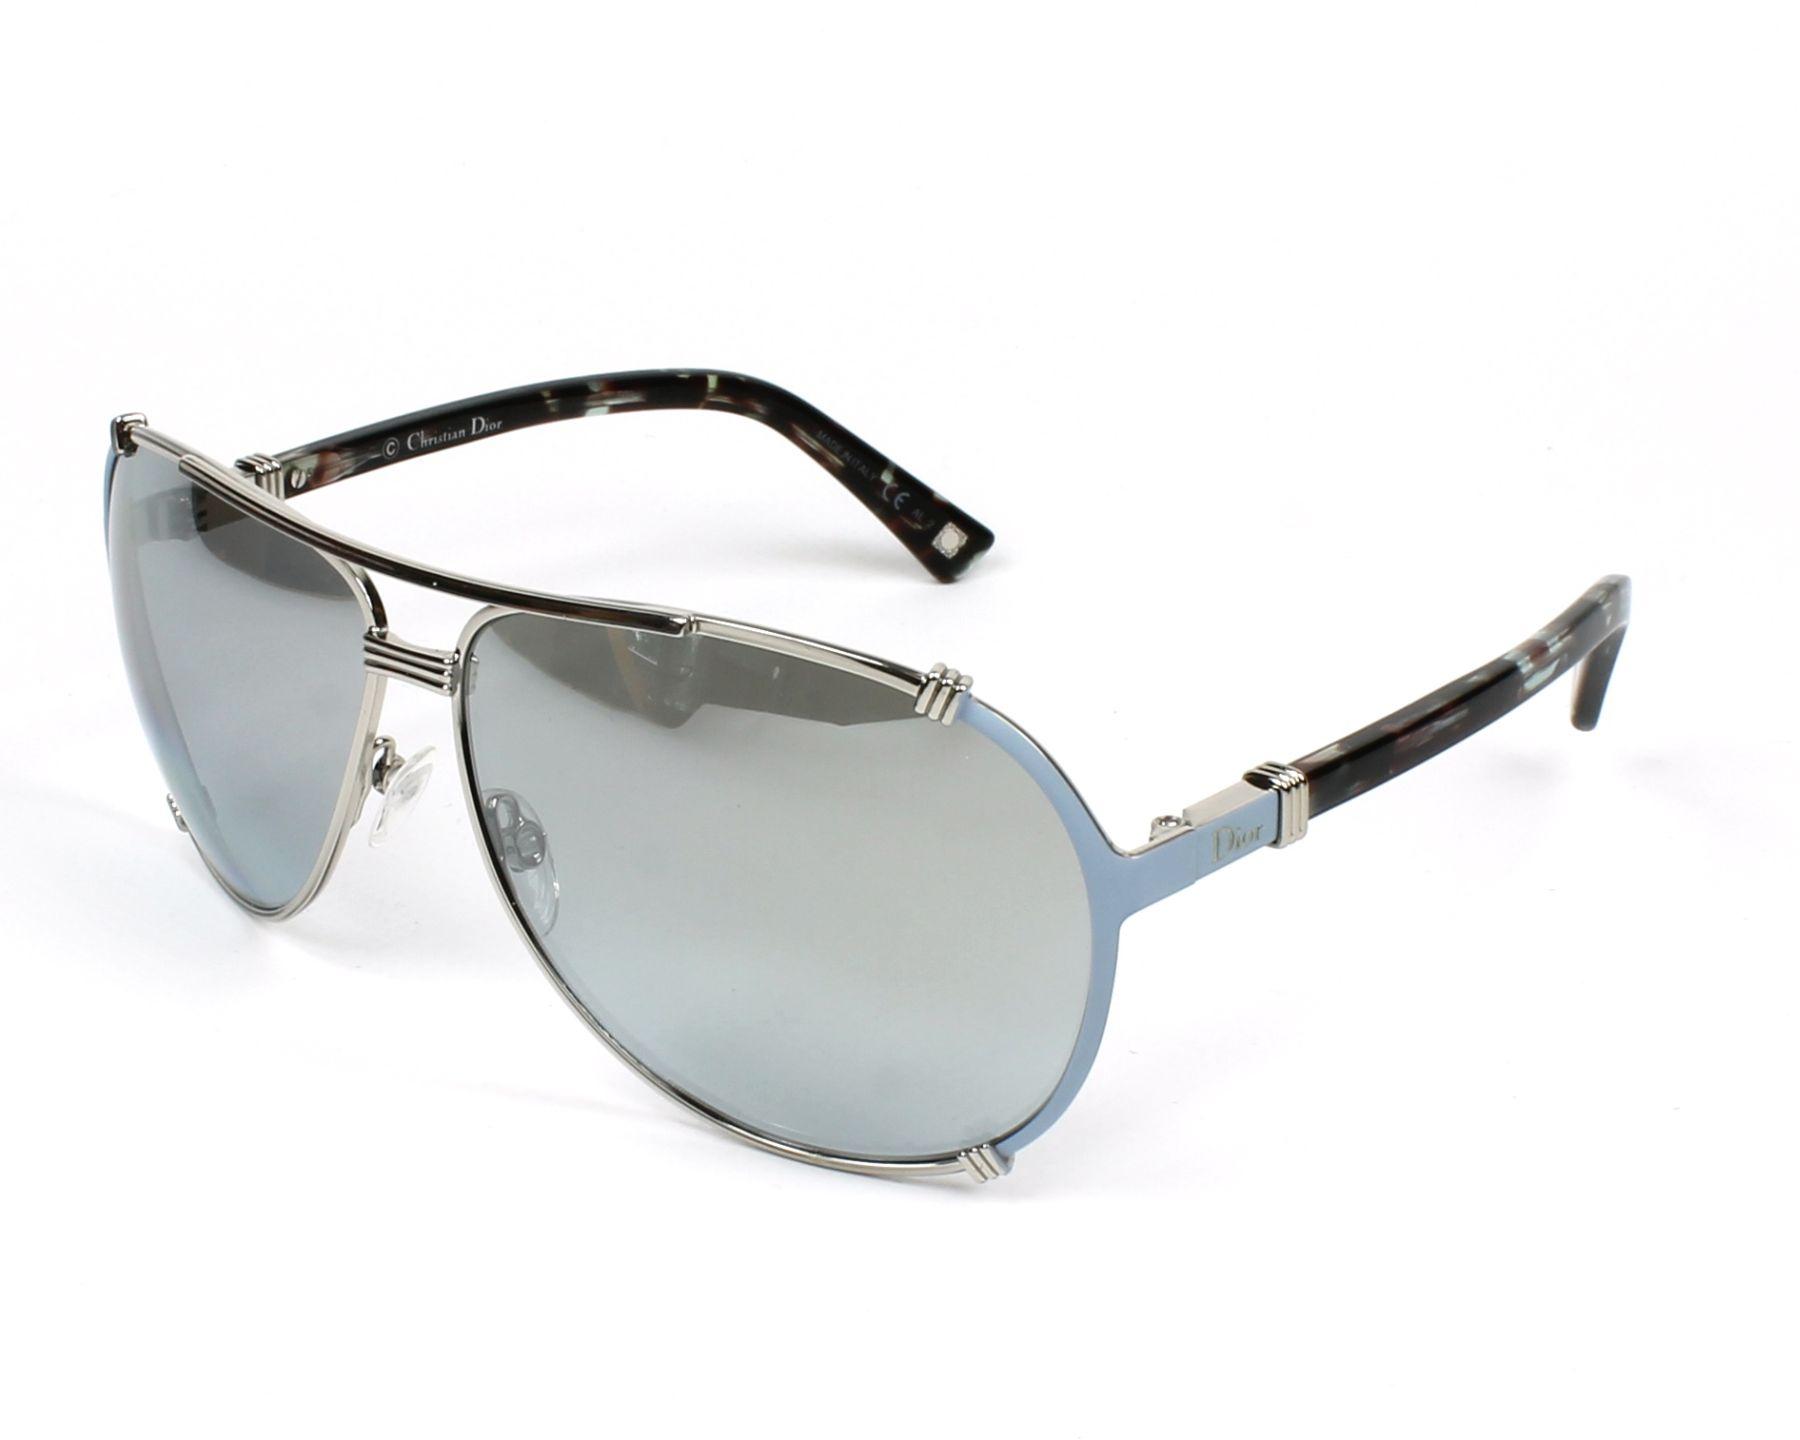 afcde4d76d7 Christian Dior CHICAGO-2 HFP 66. CHRISTIAN DIOR Chicago 2 Aviator  Sunglasses Green 119792